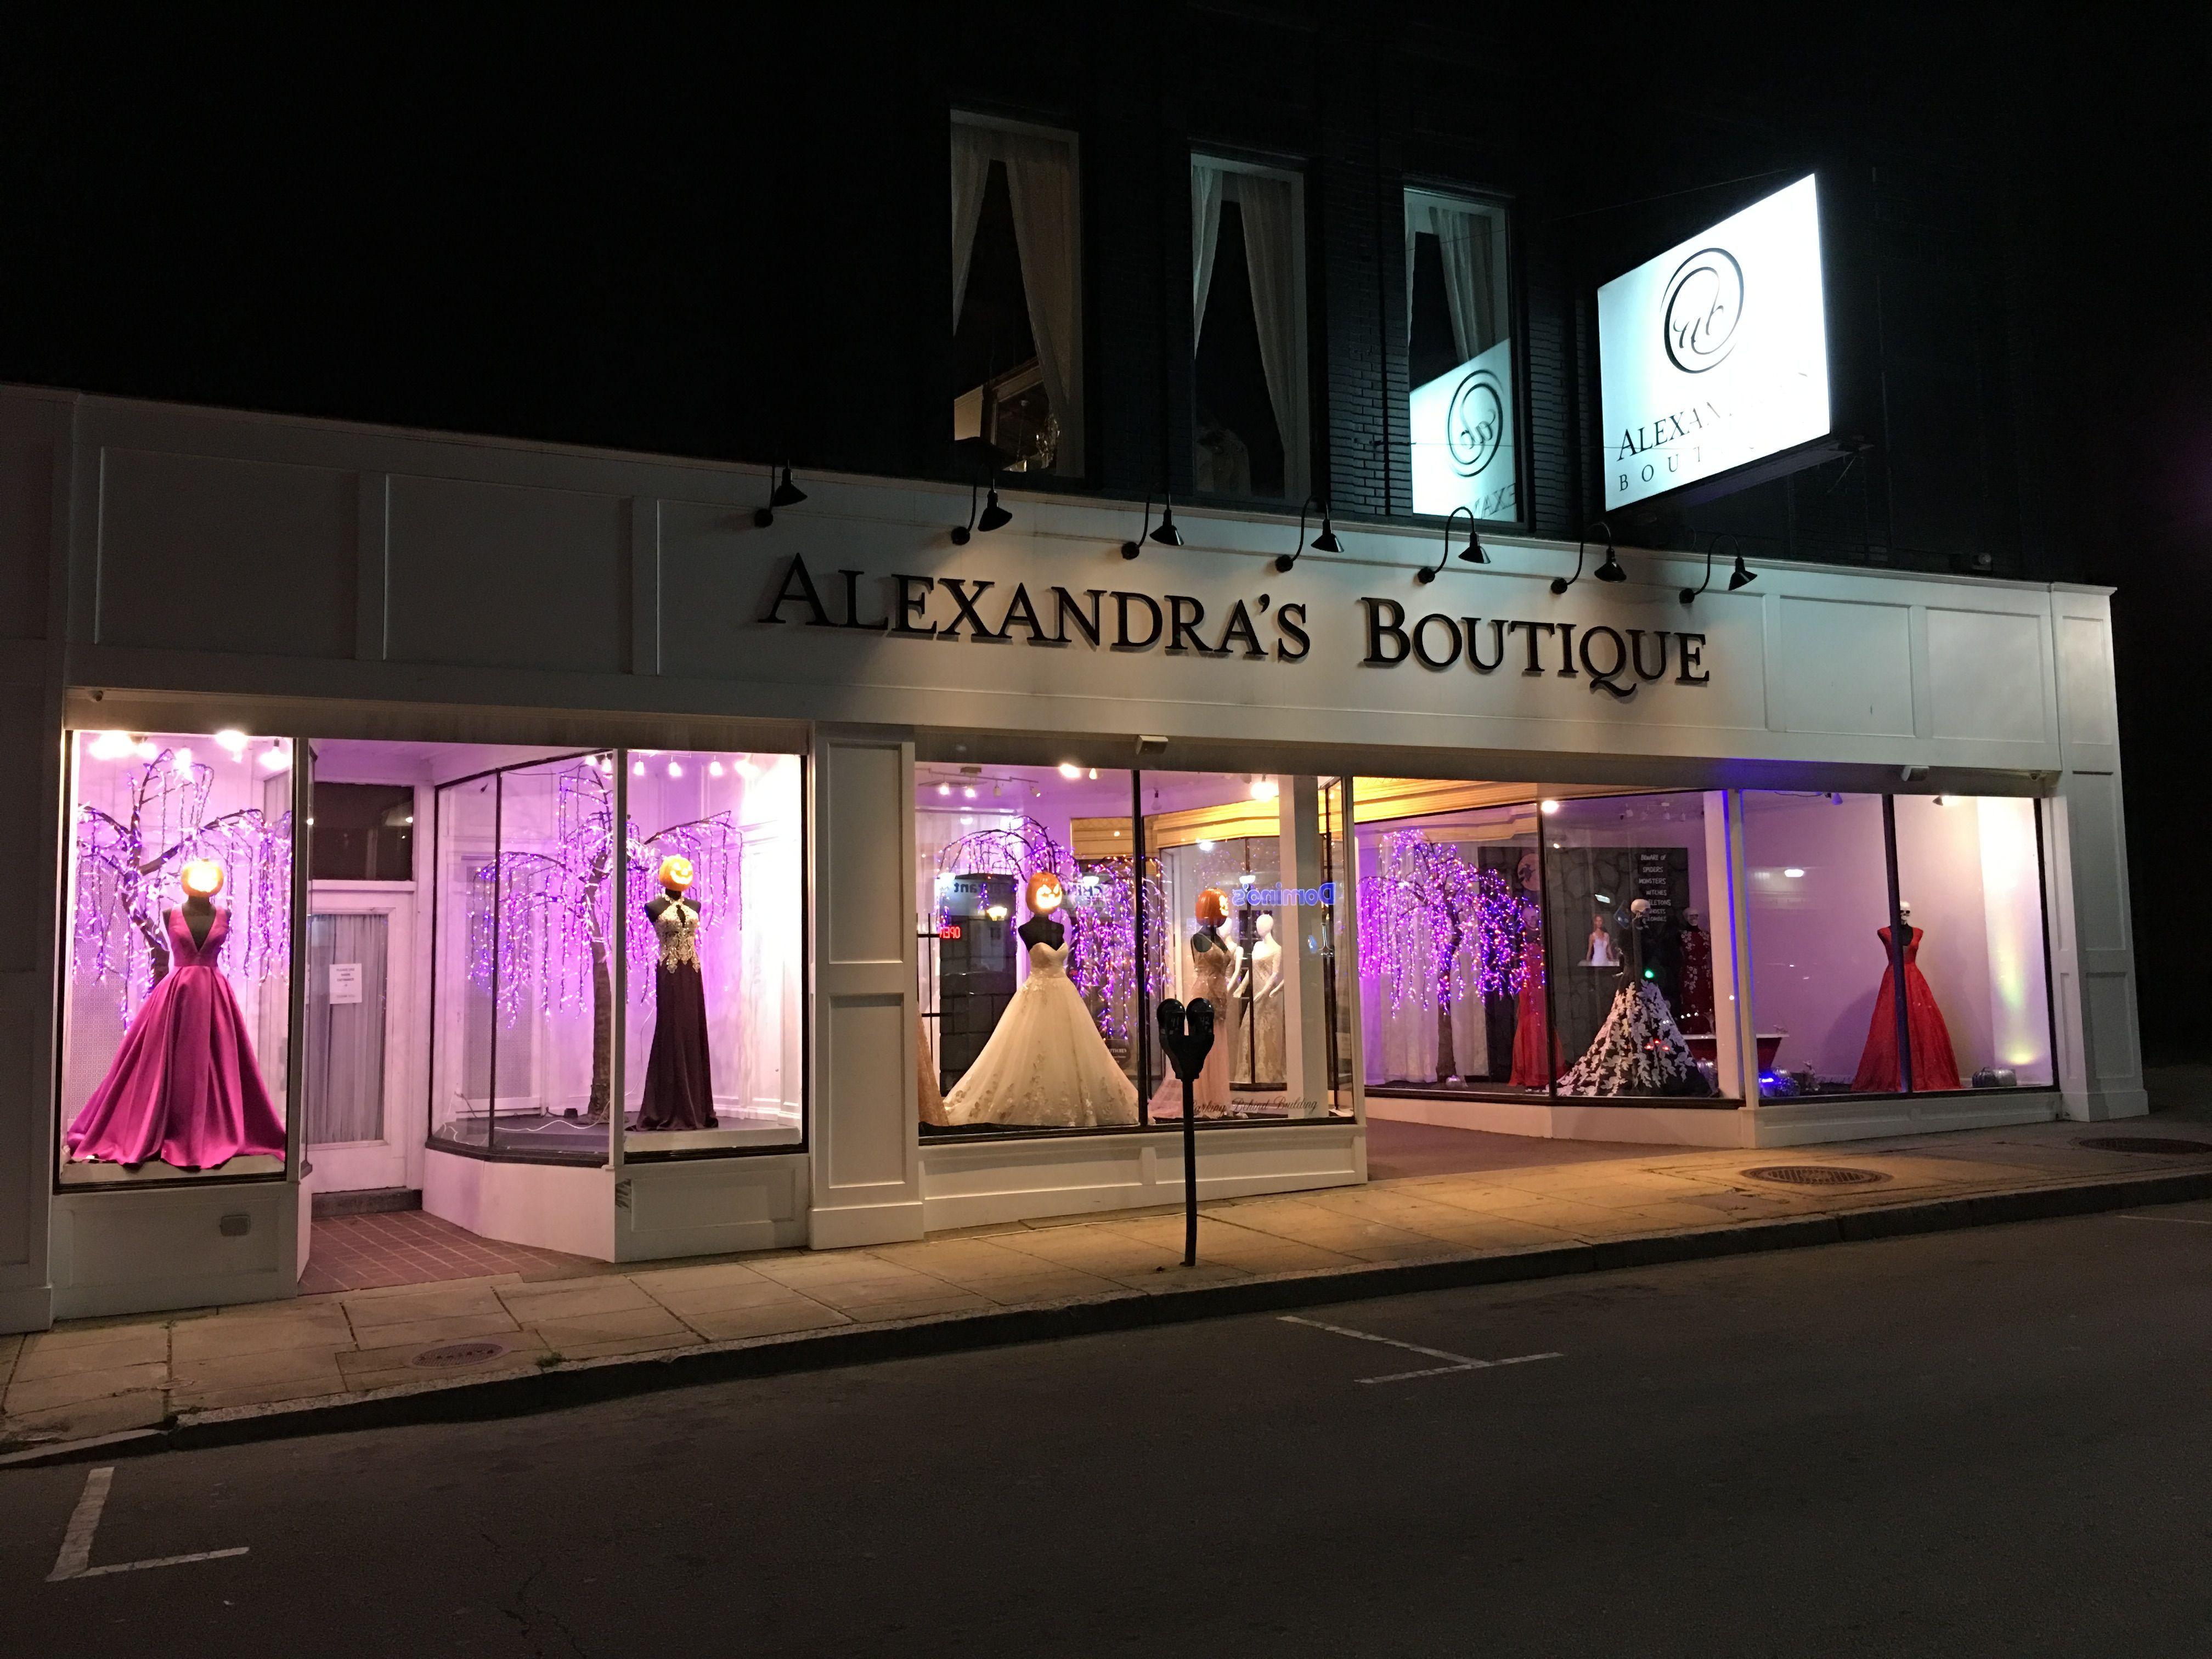 alexandra boutique, OFF 7%,Buy!